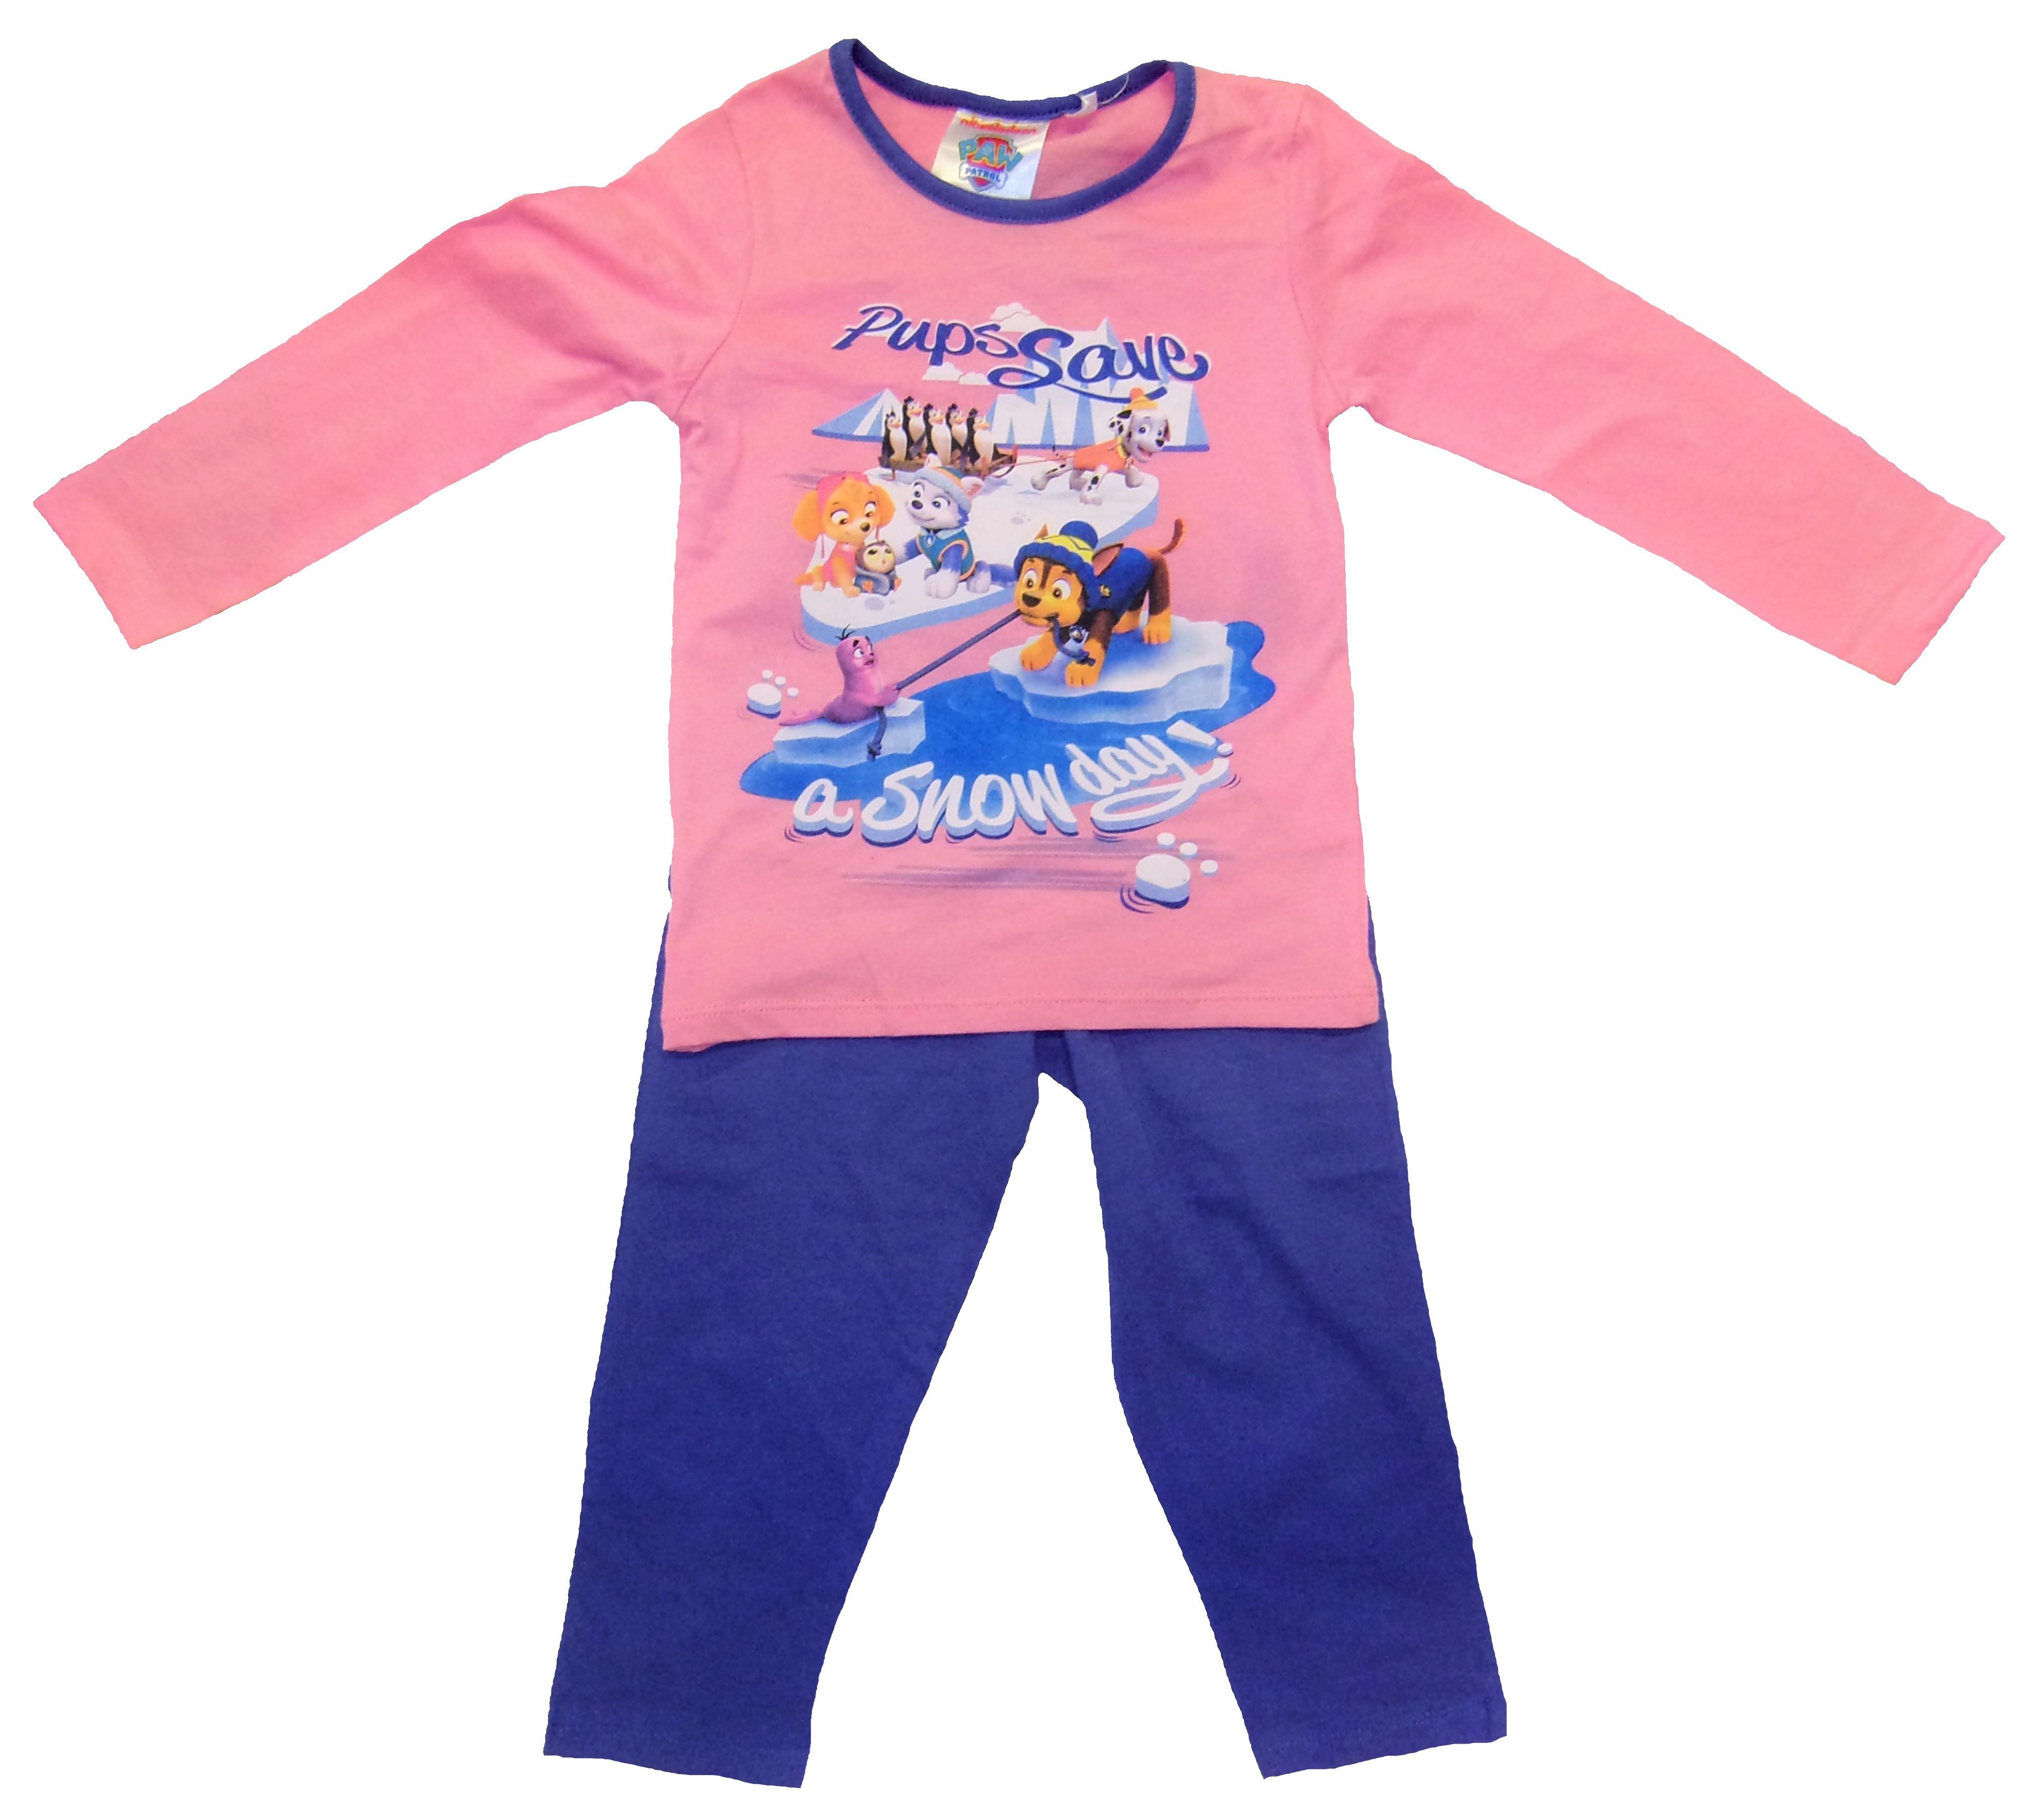 Paw Patrol Langarm Schlafanzug für Kinder rosa Größe 98